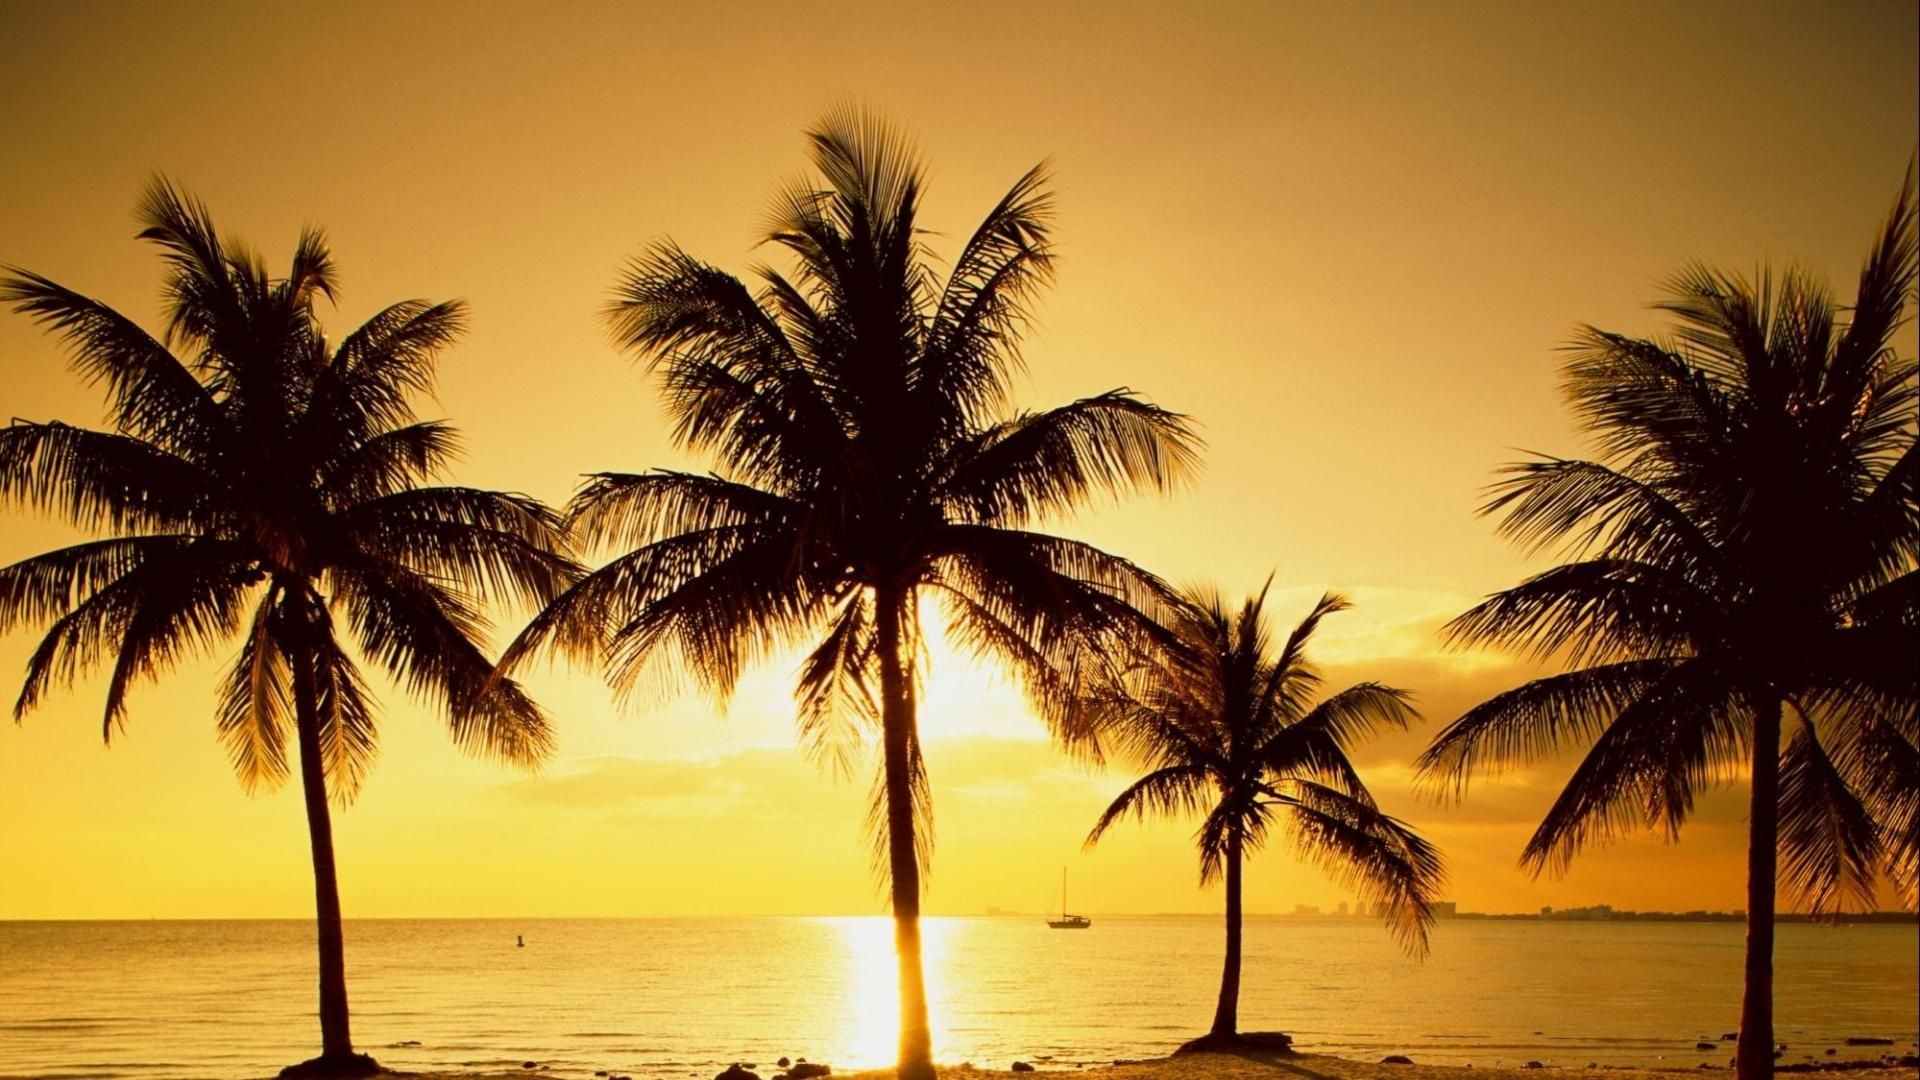 Palm Tree Sunset hd desktop